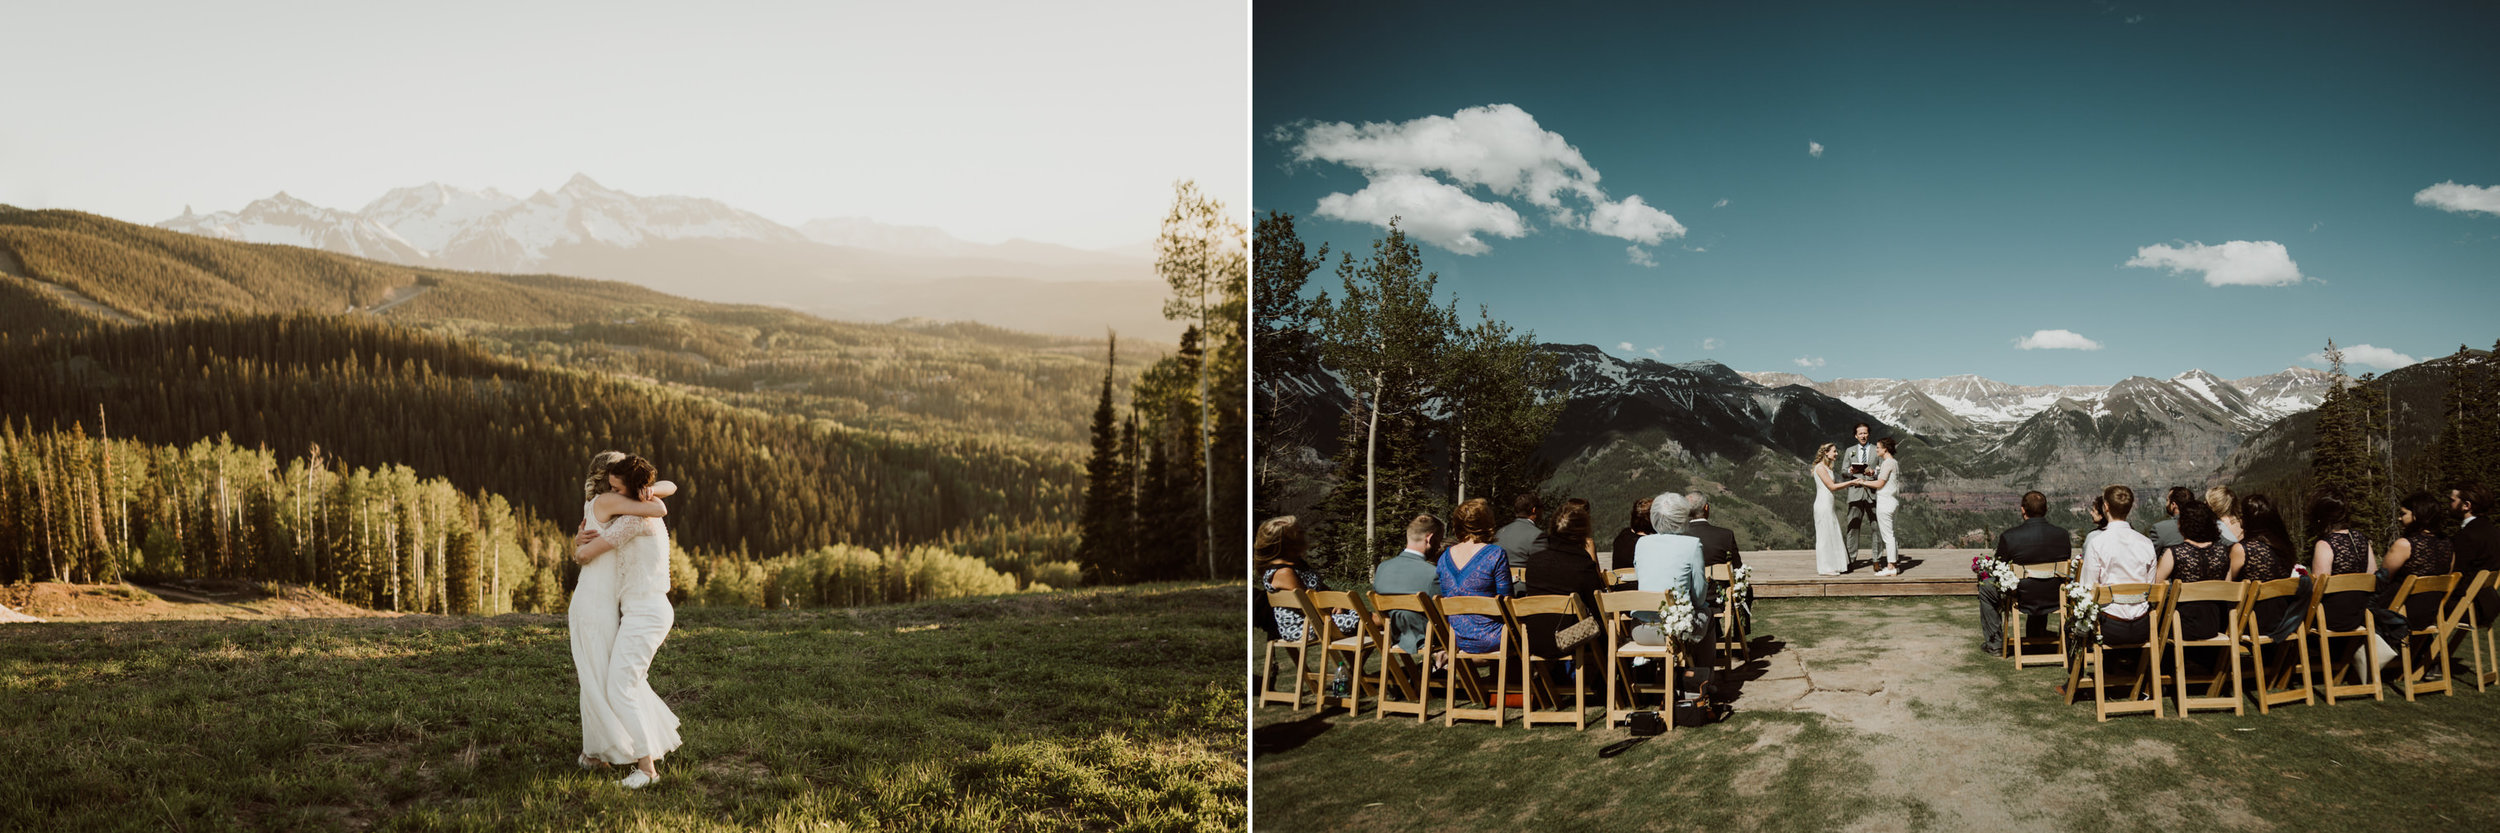 17-6-adventure-wedding-photographer-17.jpg